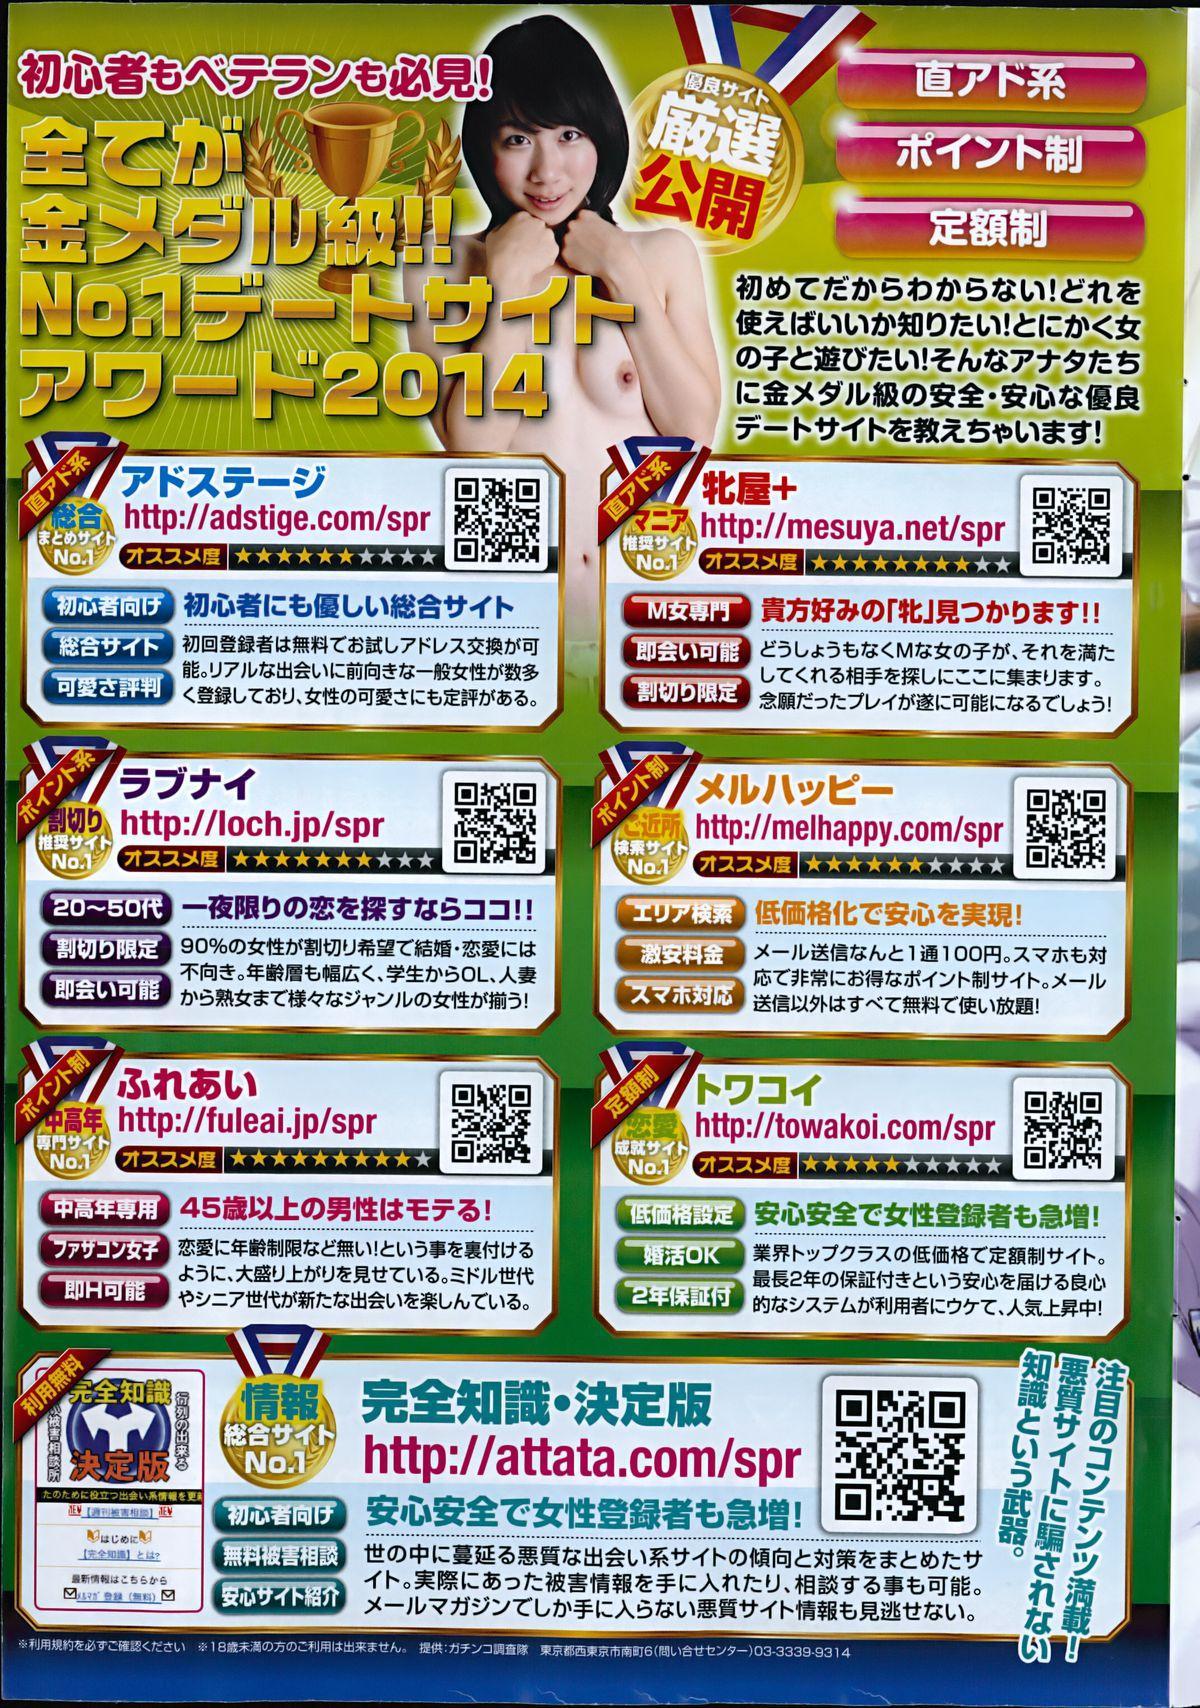 COMIC Penguin Club Sanzokuban 2014-11 238